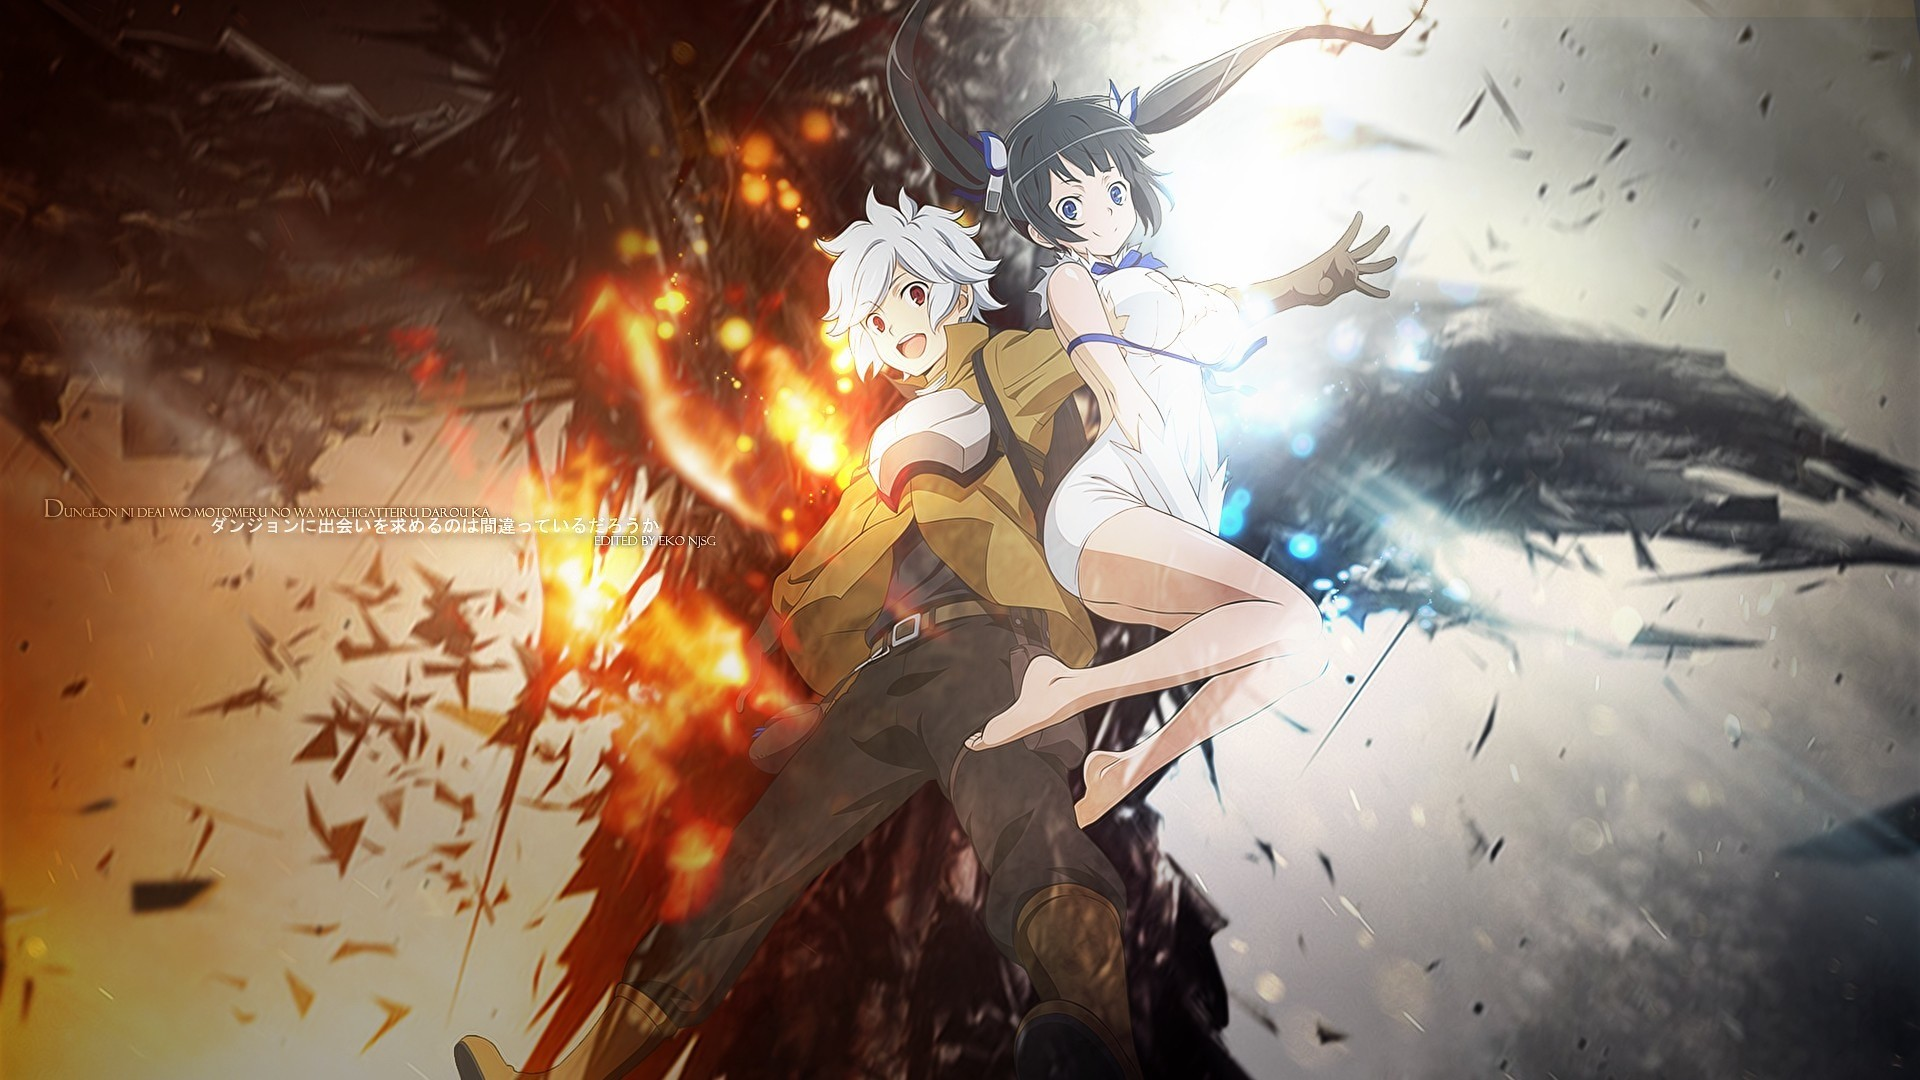 anime : dungeon ni deai wo motomeru no wa machigatteiru darou ka chara :  bell x hestia new anime and i think you must watch this anime hope y.